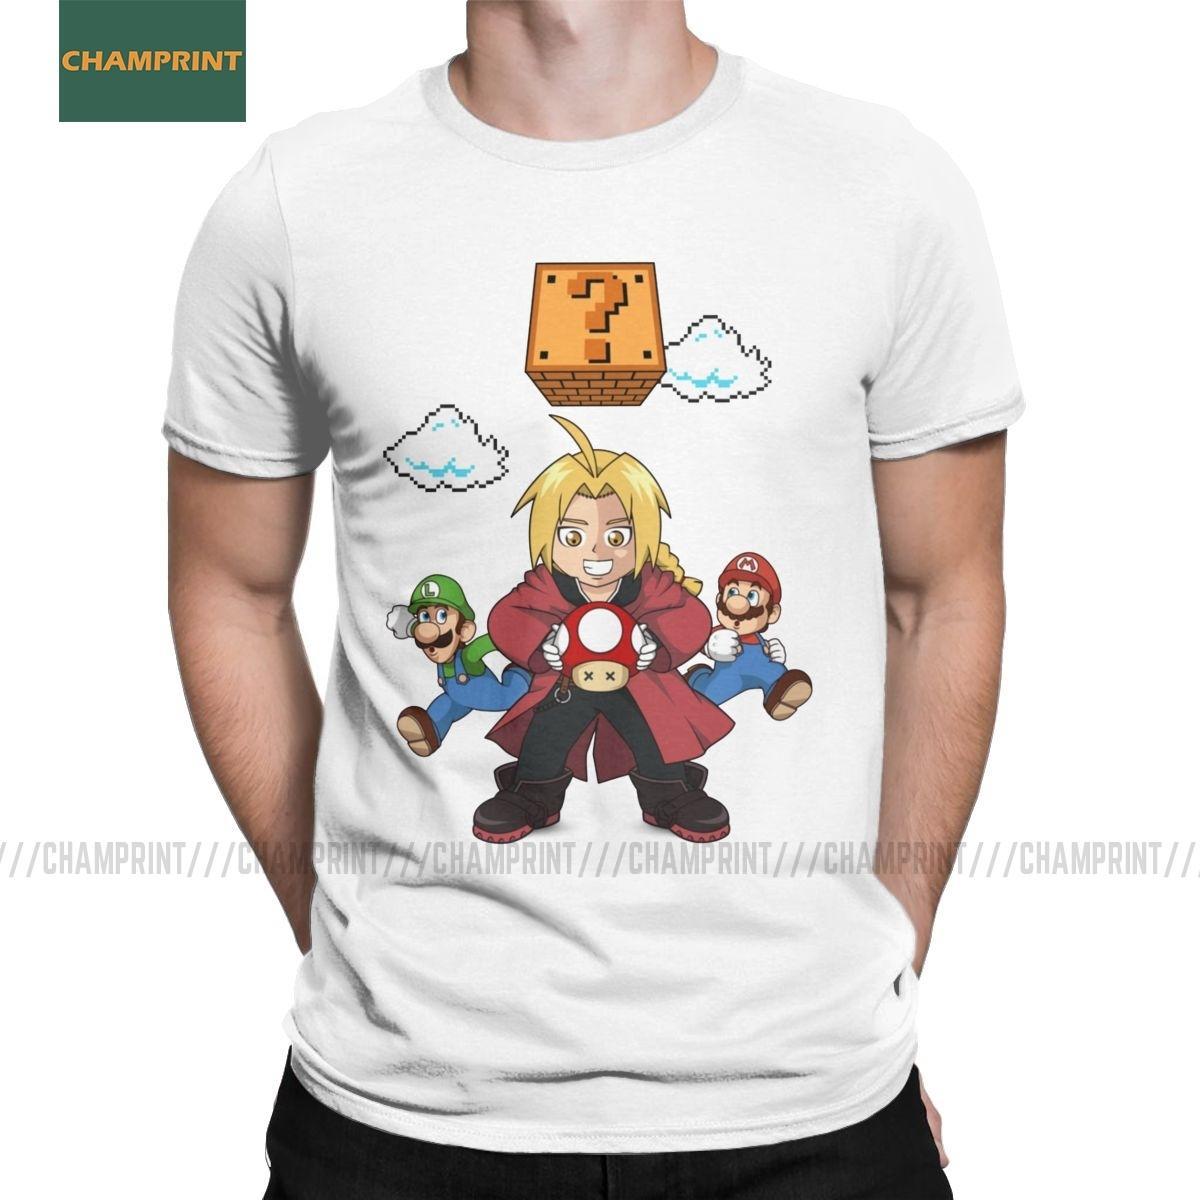 Uomo T-shirt Super Elric Brothers Fullmetal Alchemist cotone Tees manica corta Elric Edward Anime Manga Fma Arakawa T Shirts